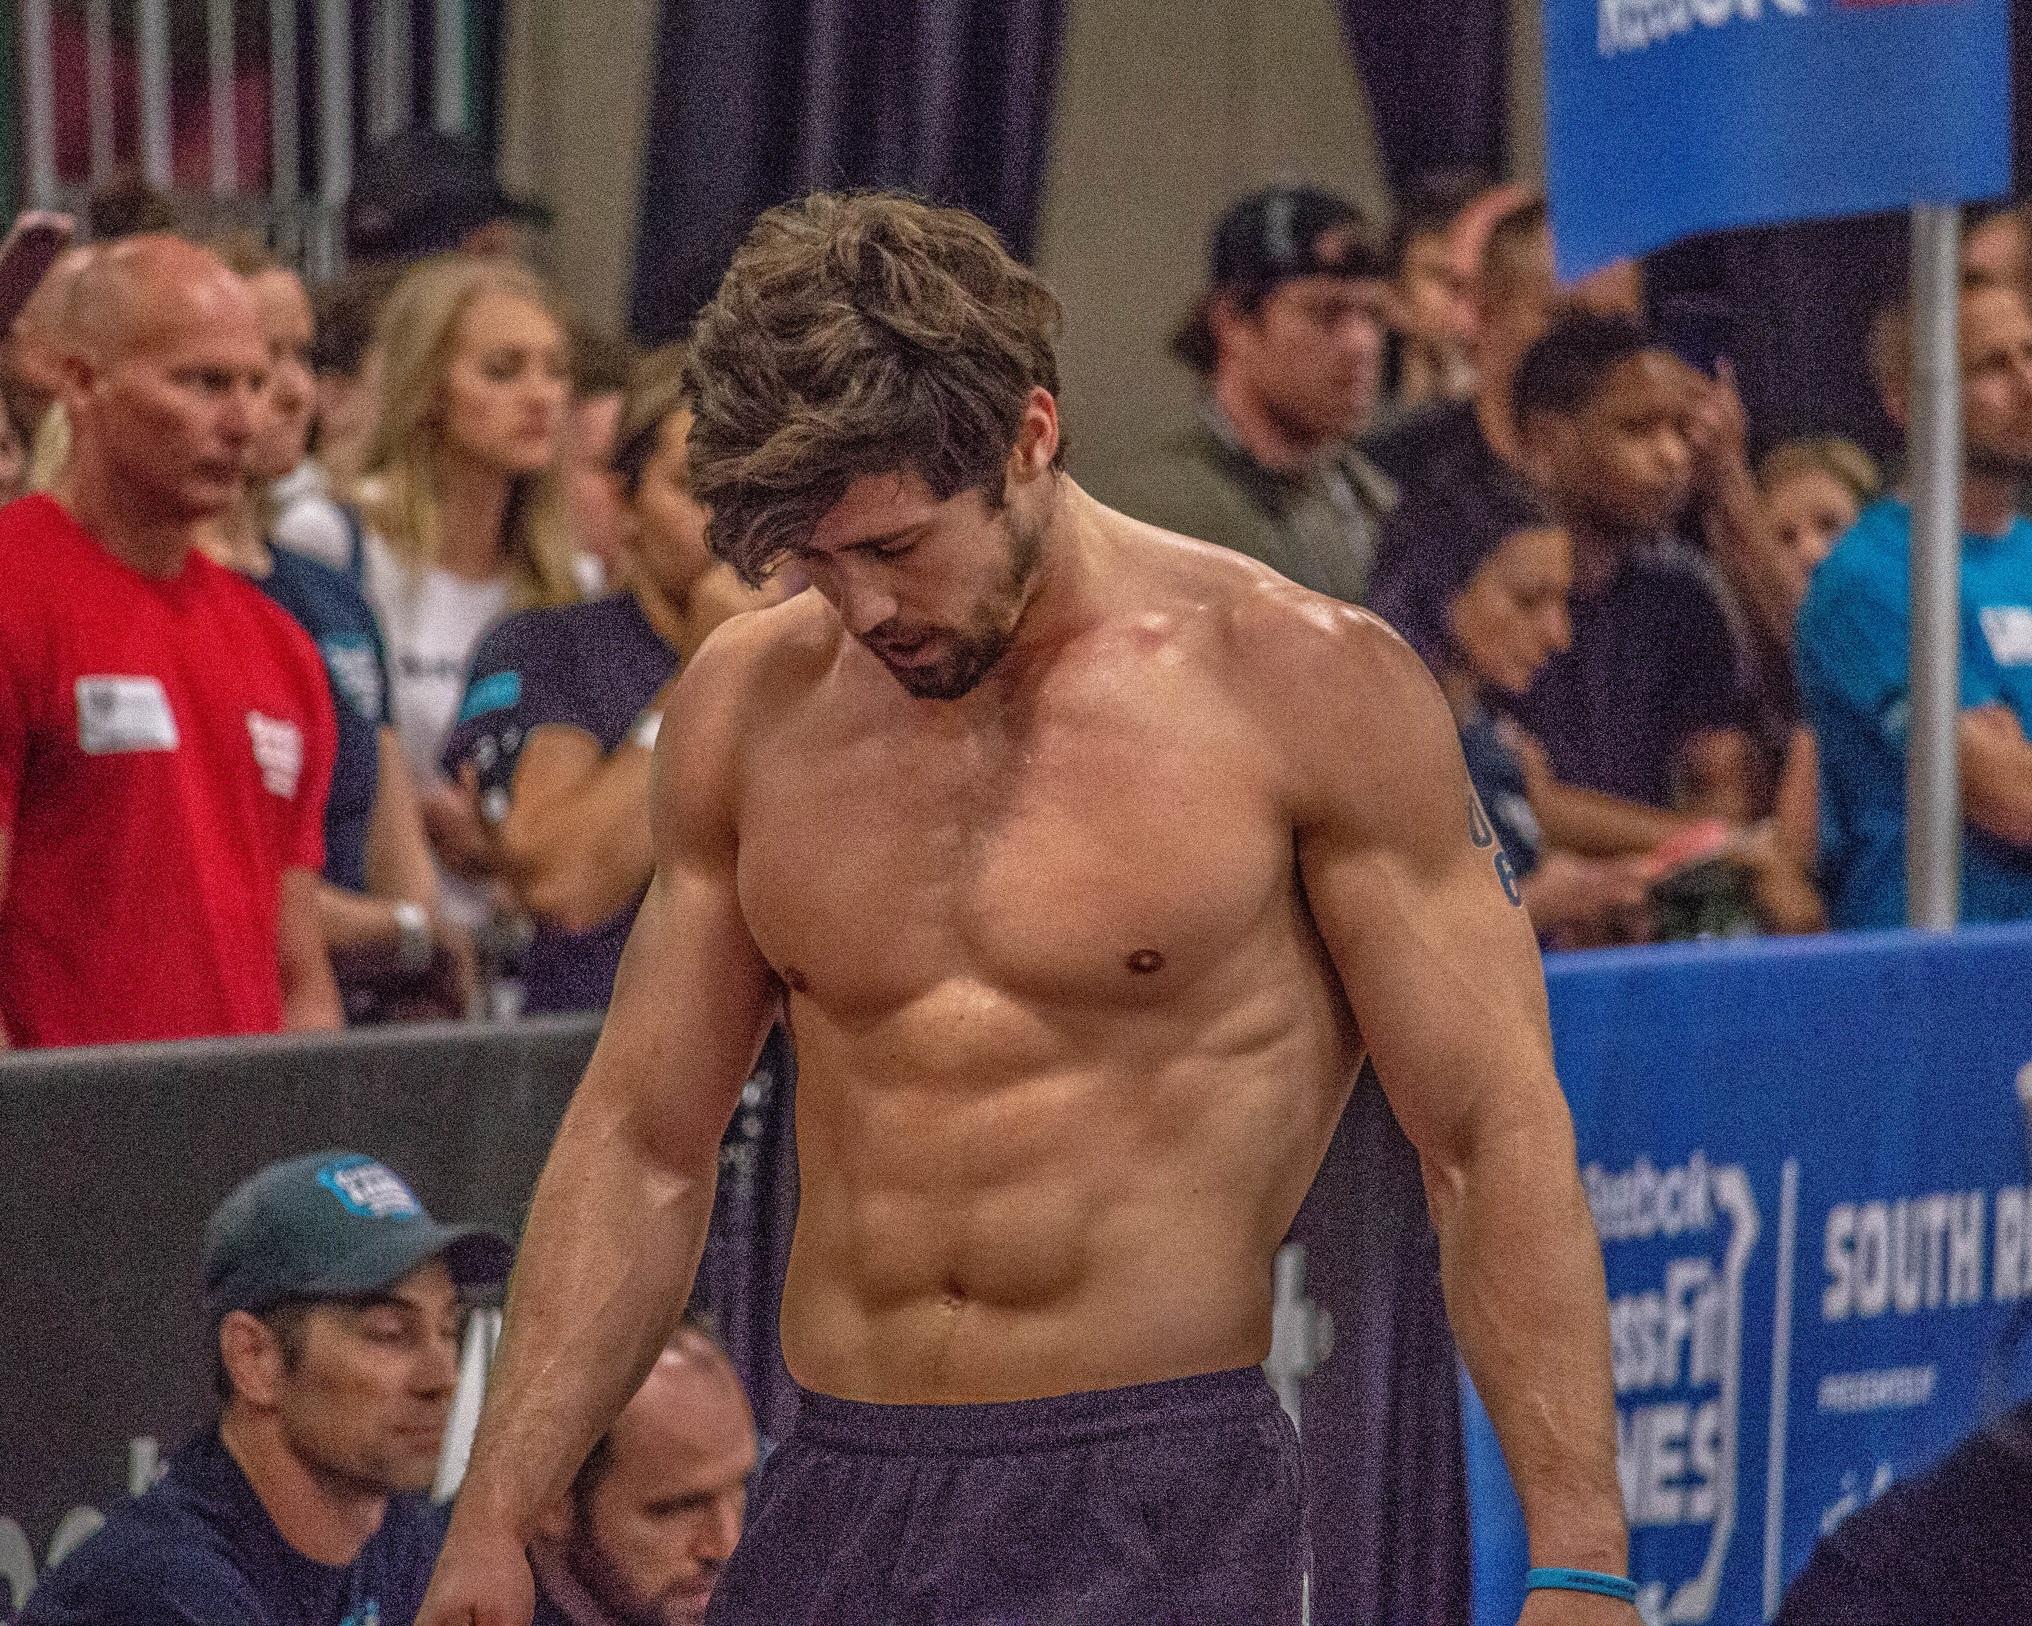 #12 Brandon Luckett: Top 25 US CrossFit Athlete -